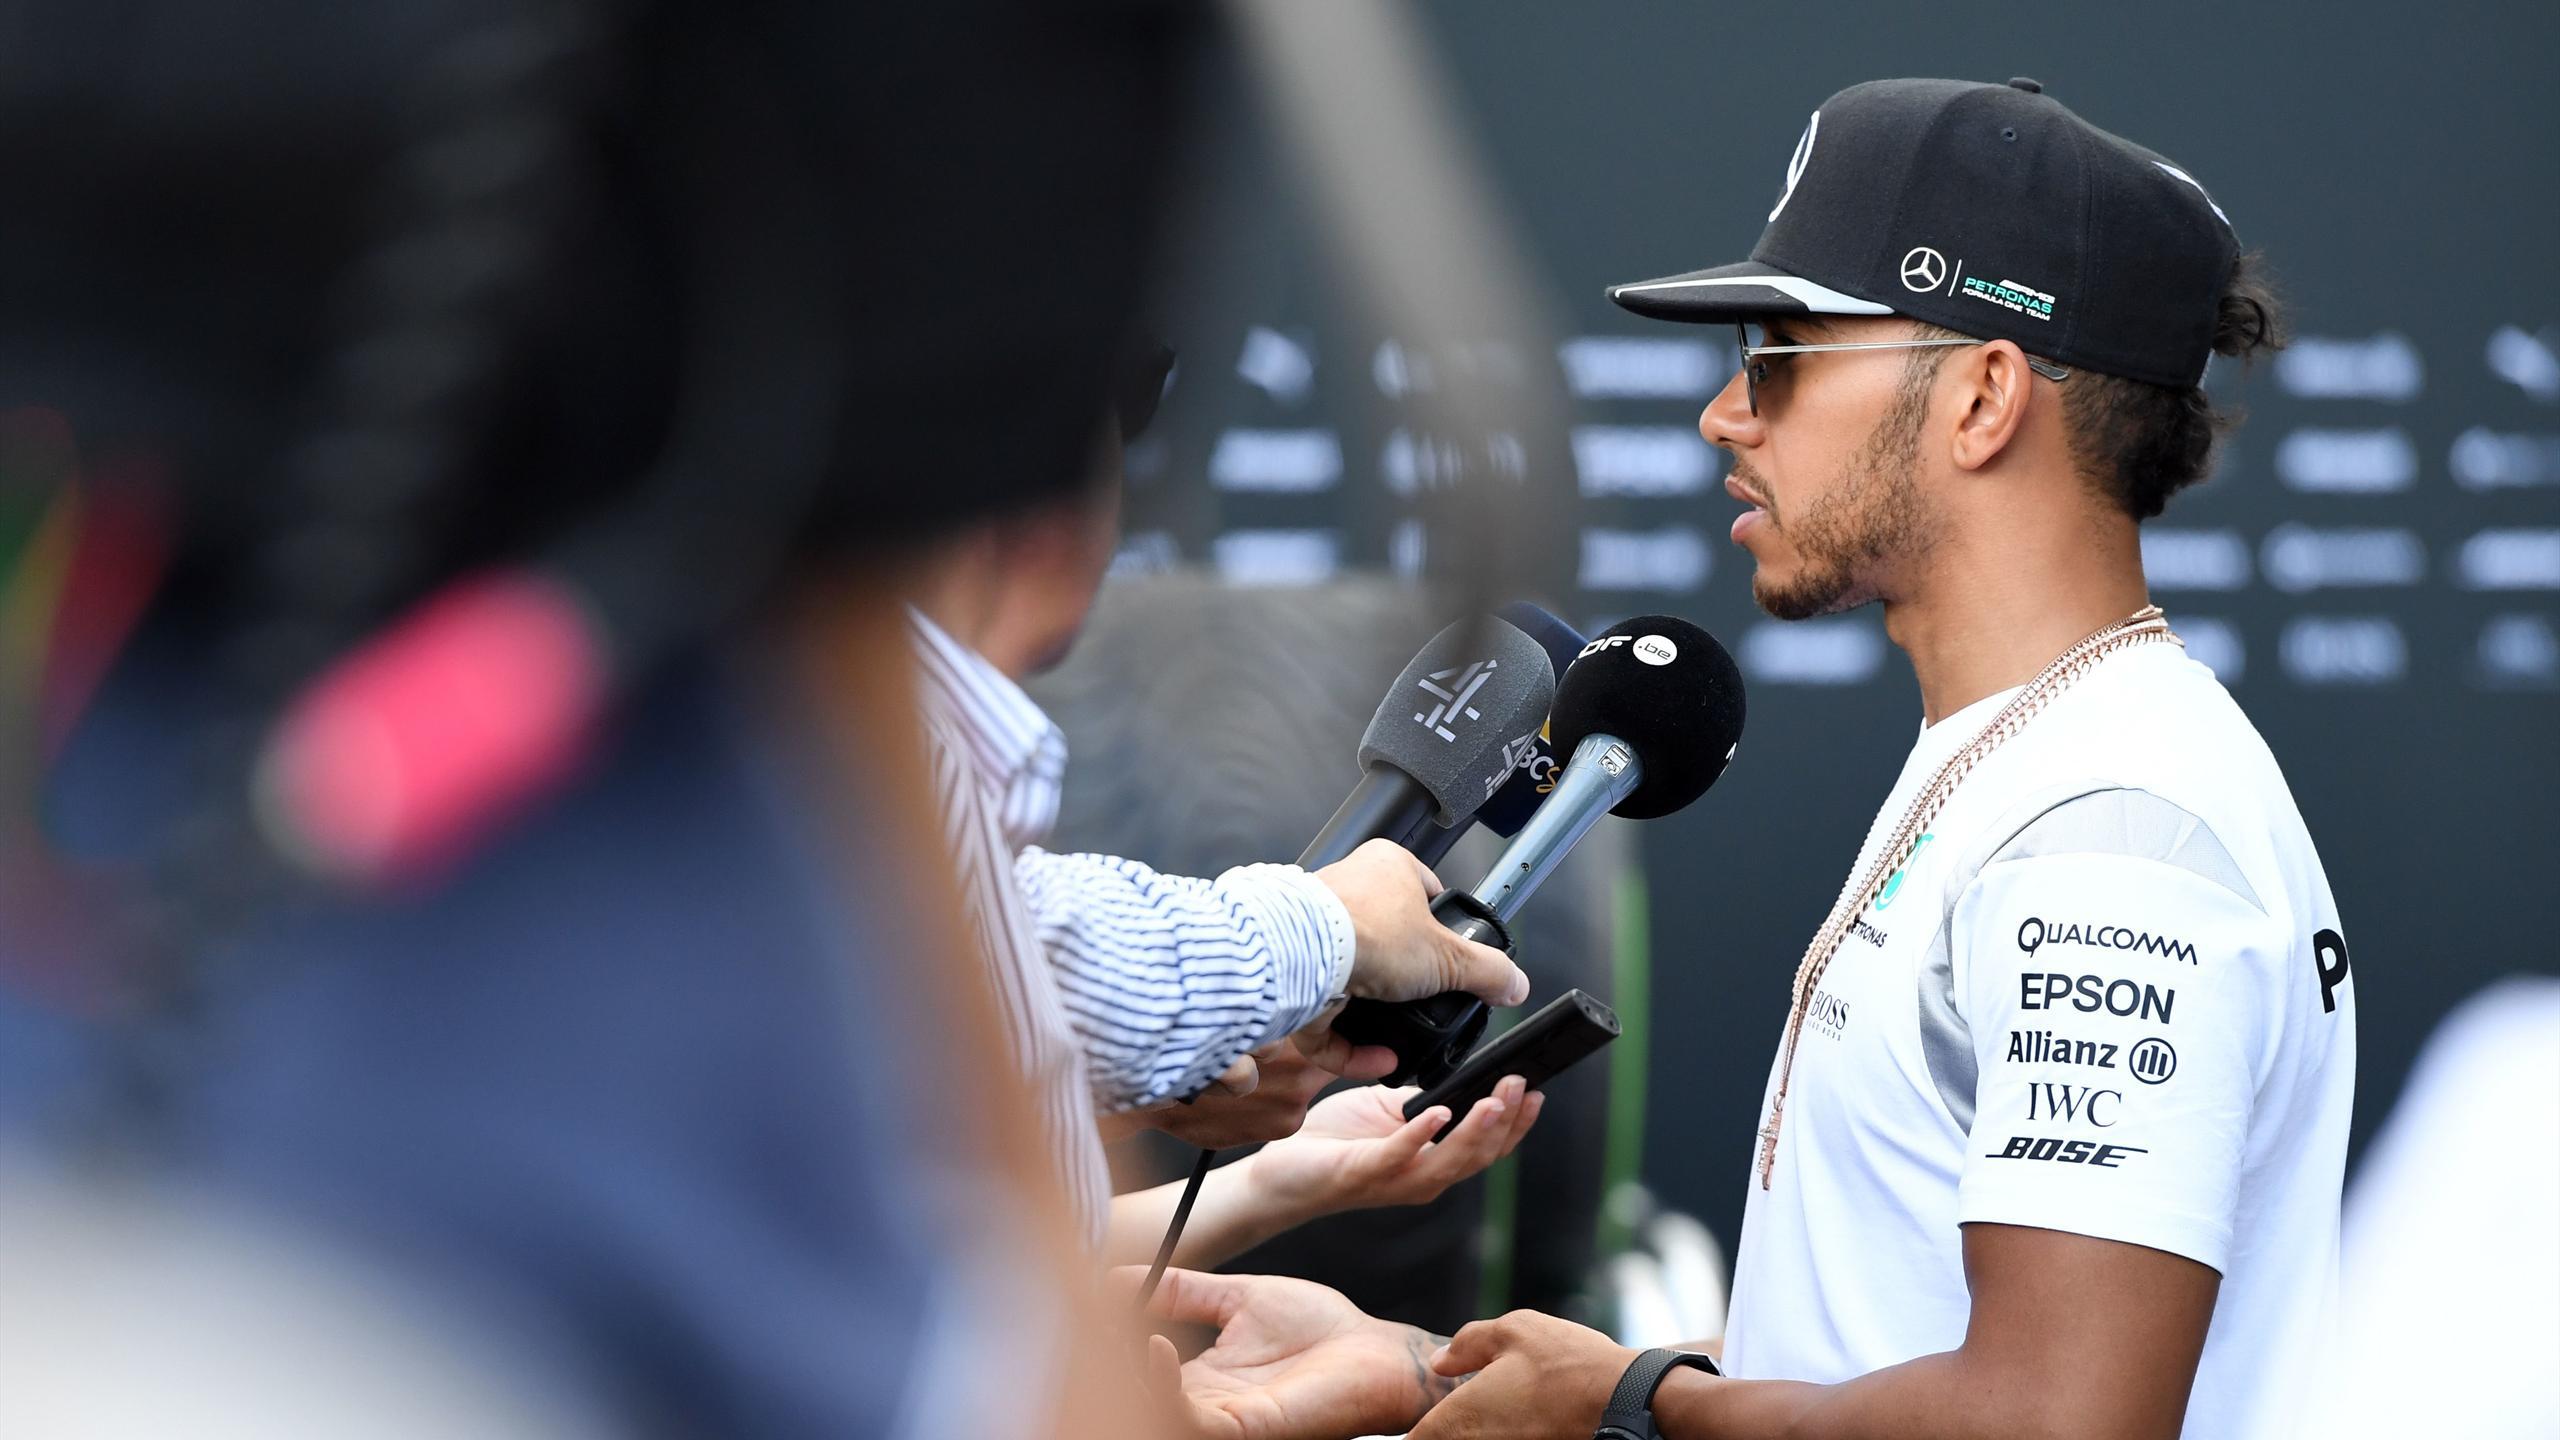 Lewis Hamilton (Mercedes) - GP of Hungary 2016